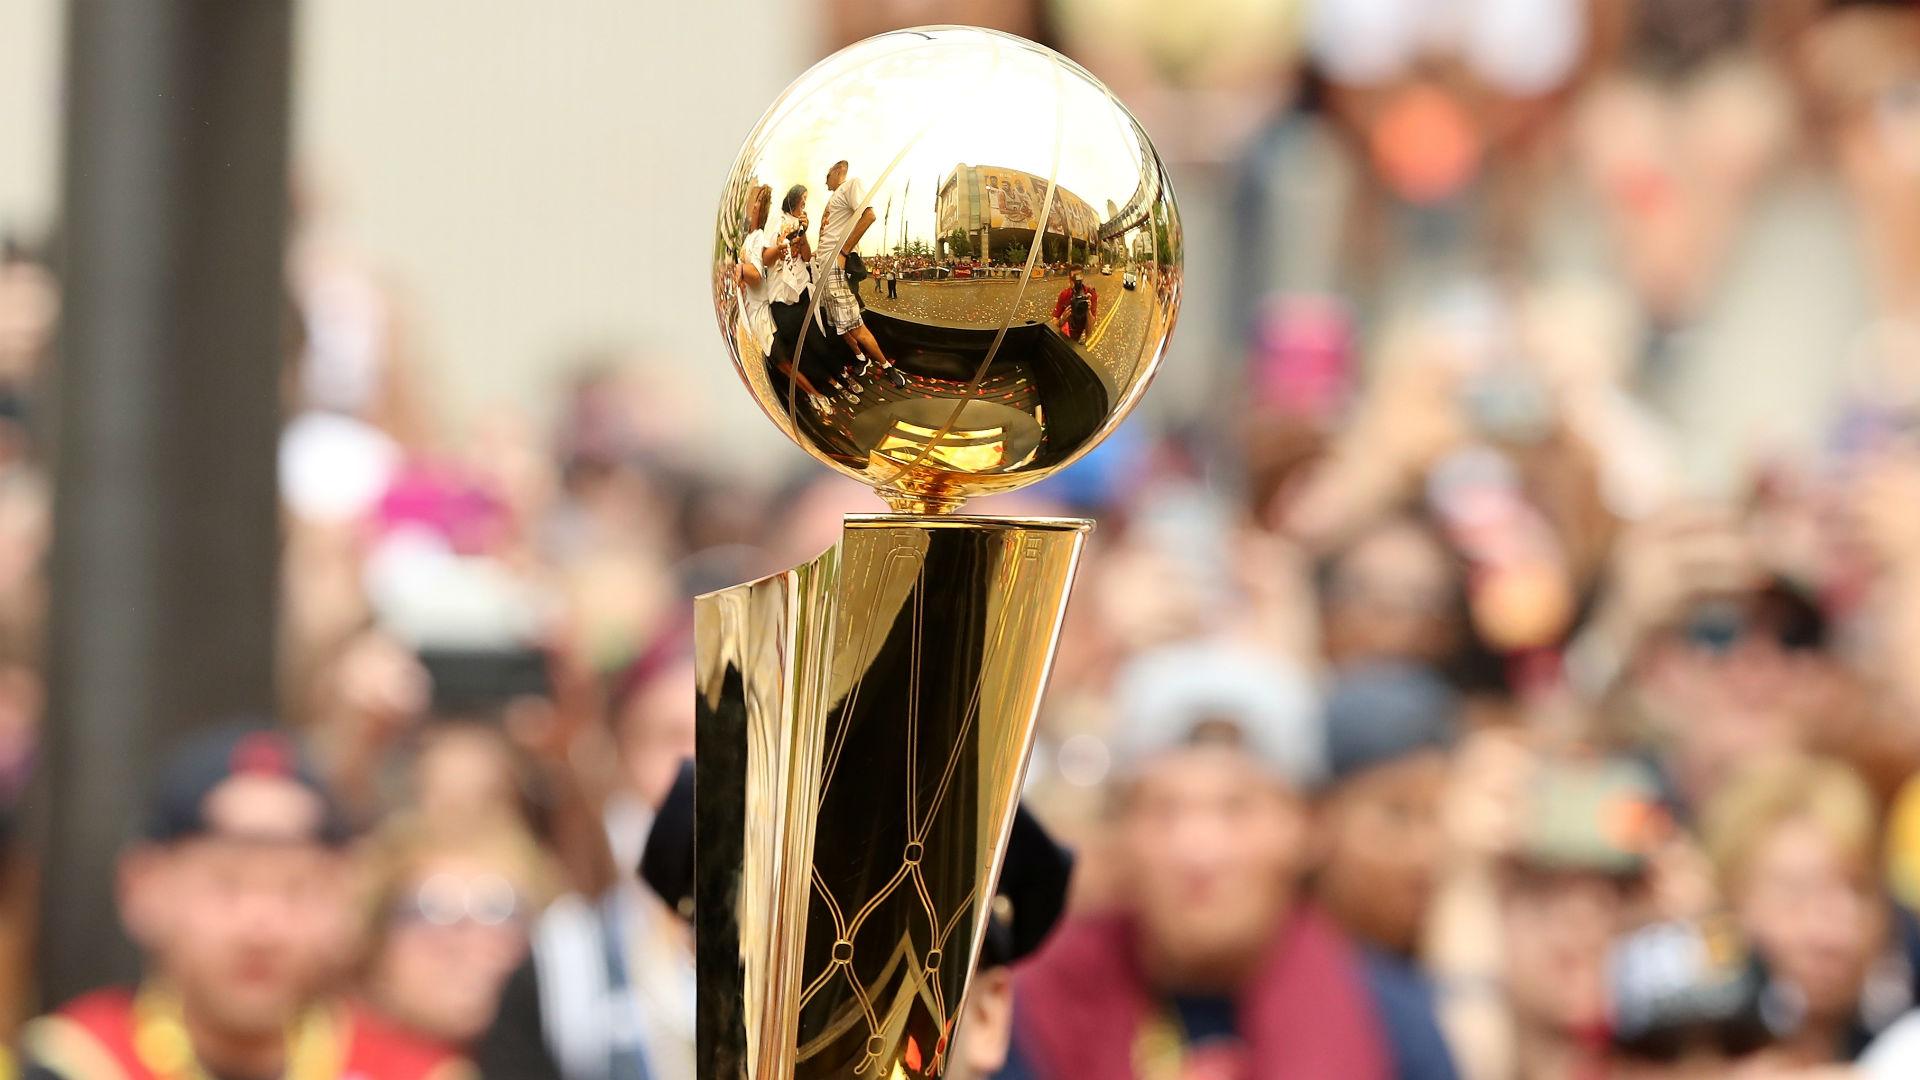 NBA Finals schedule 2019: Dates, times, TV channel, live stream for Raptors vs. Warriors